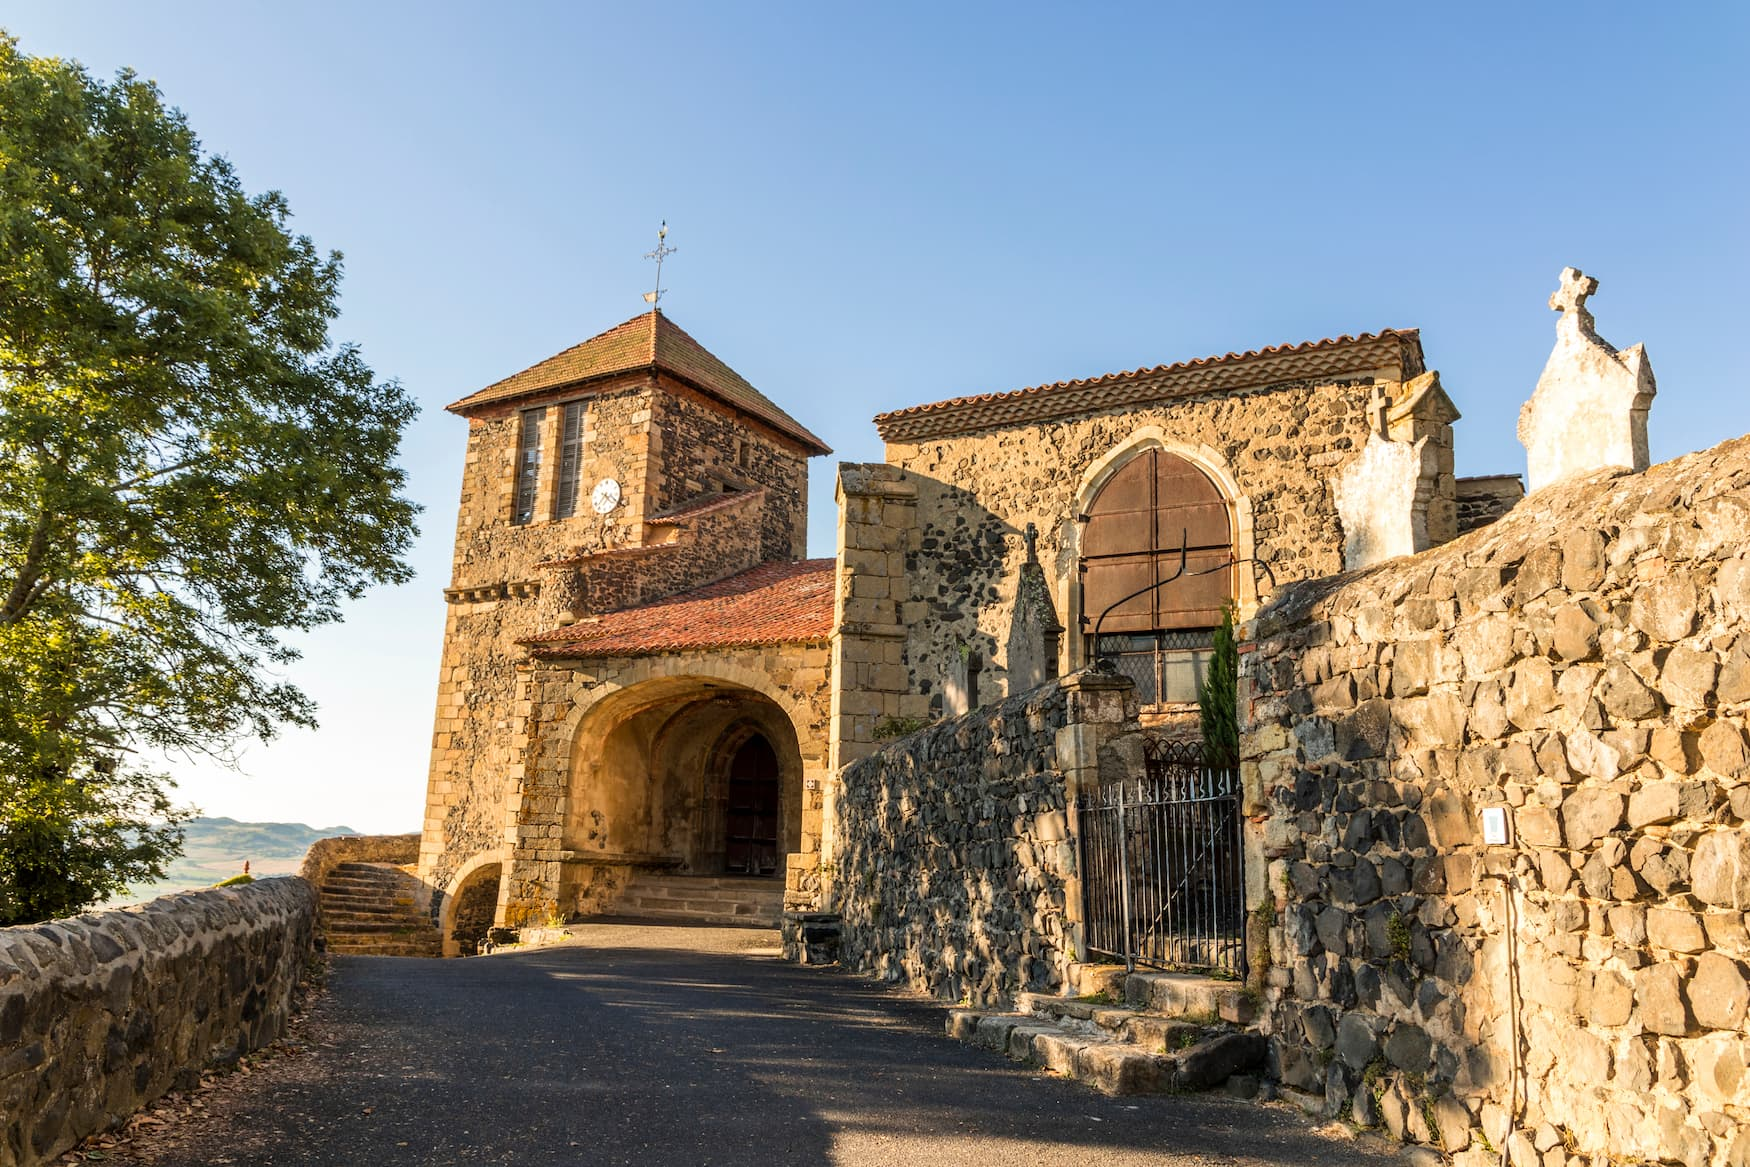 Kirche St. Maurice in Usson, Auvergne, Frankreich